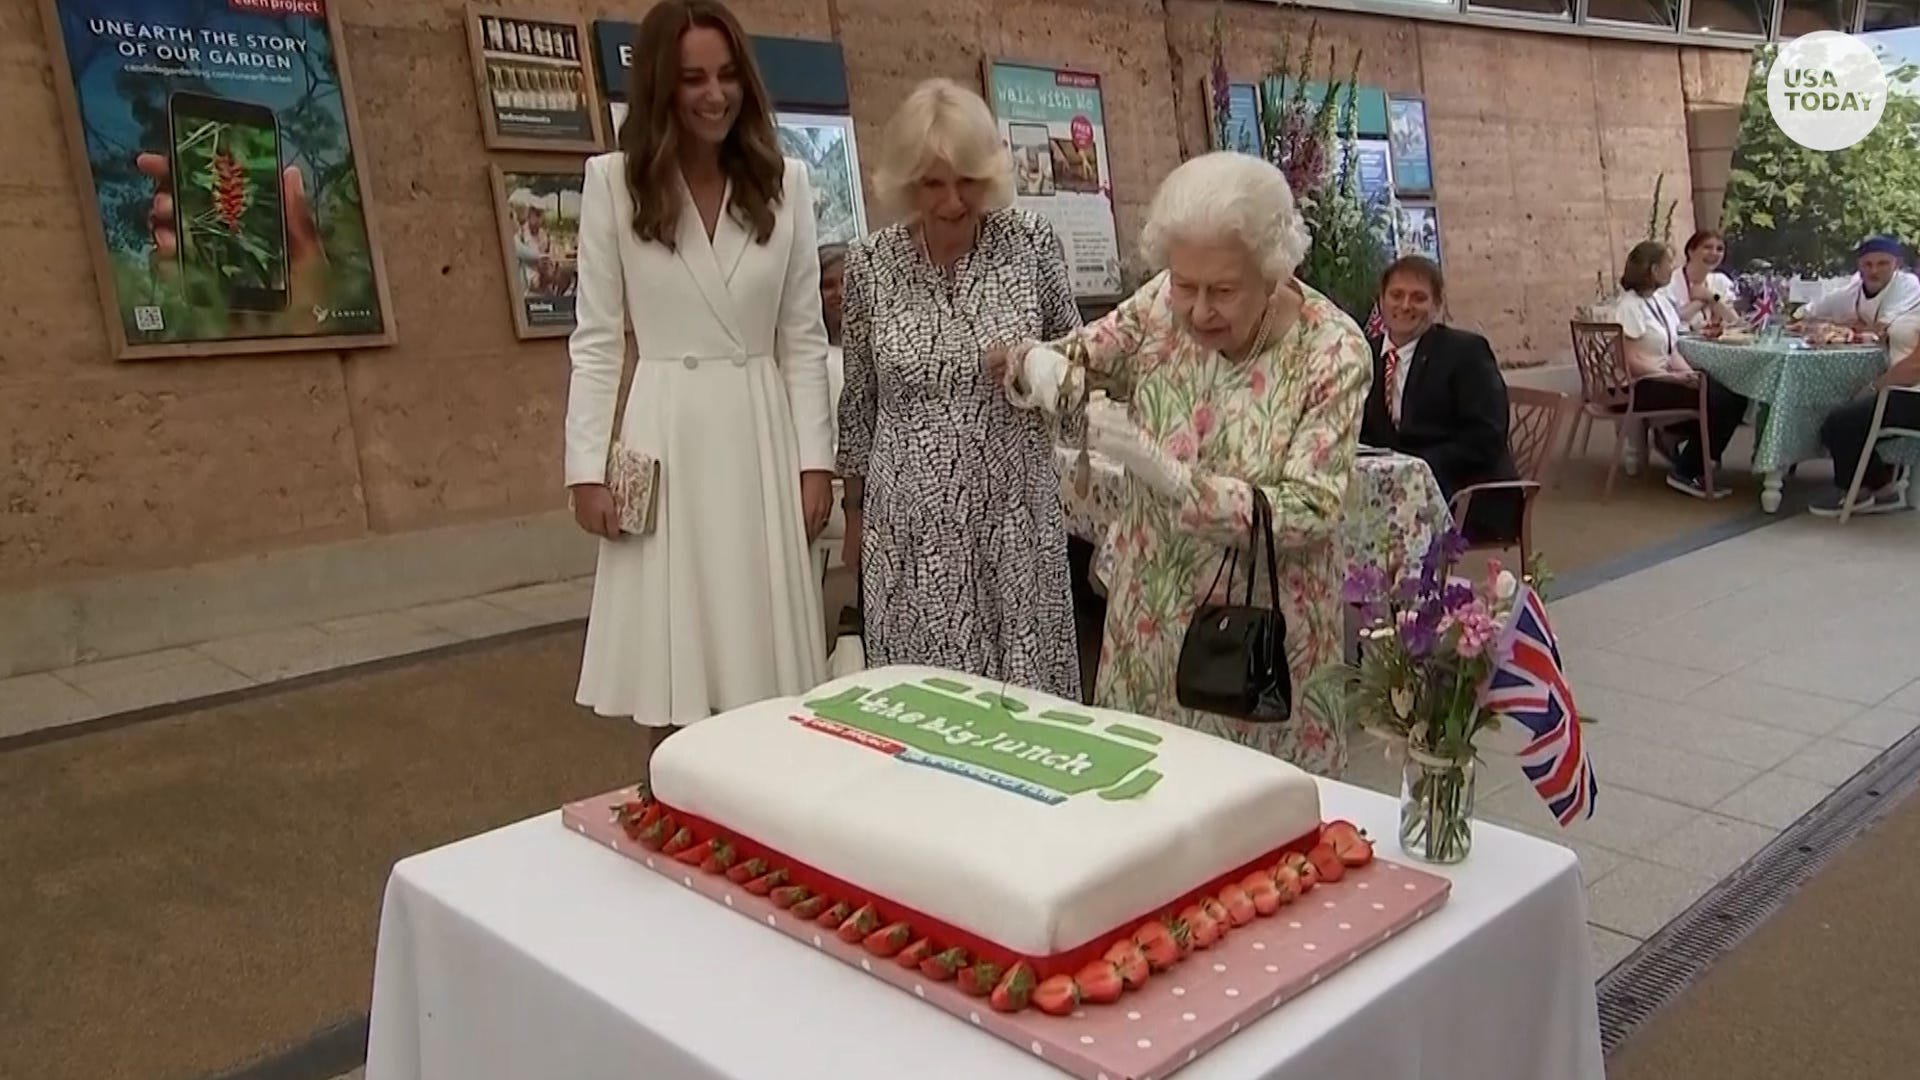 Queen Elizabeth II cuts a cake with a massive ceremonial sword